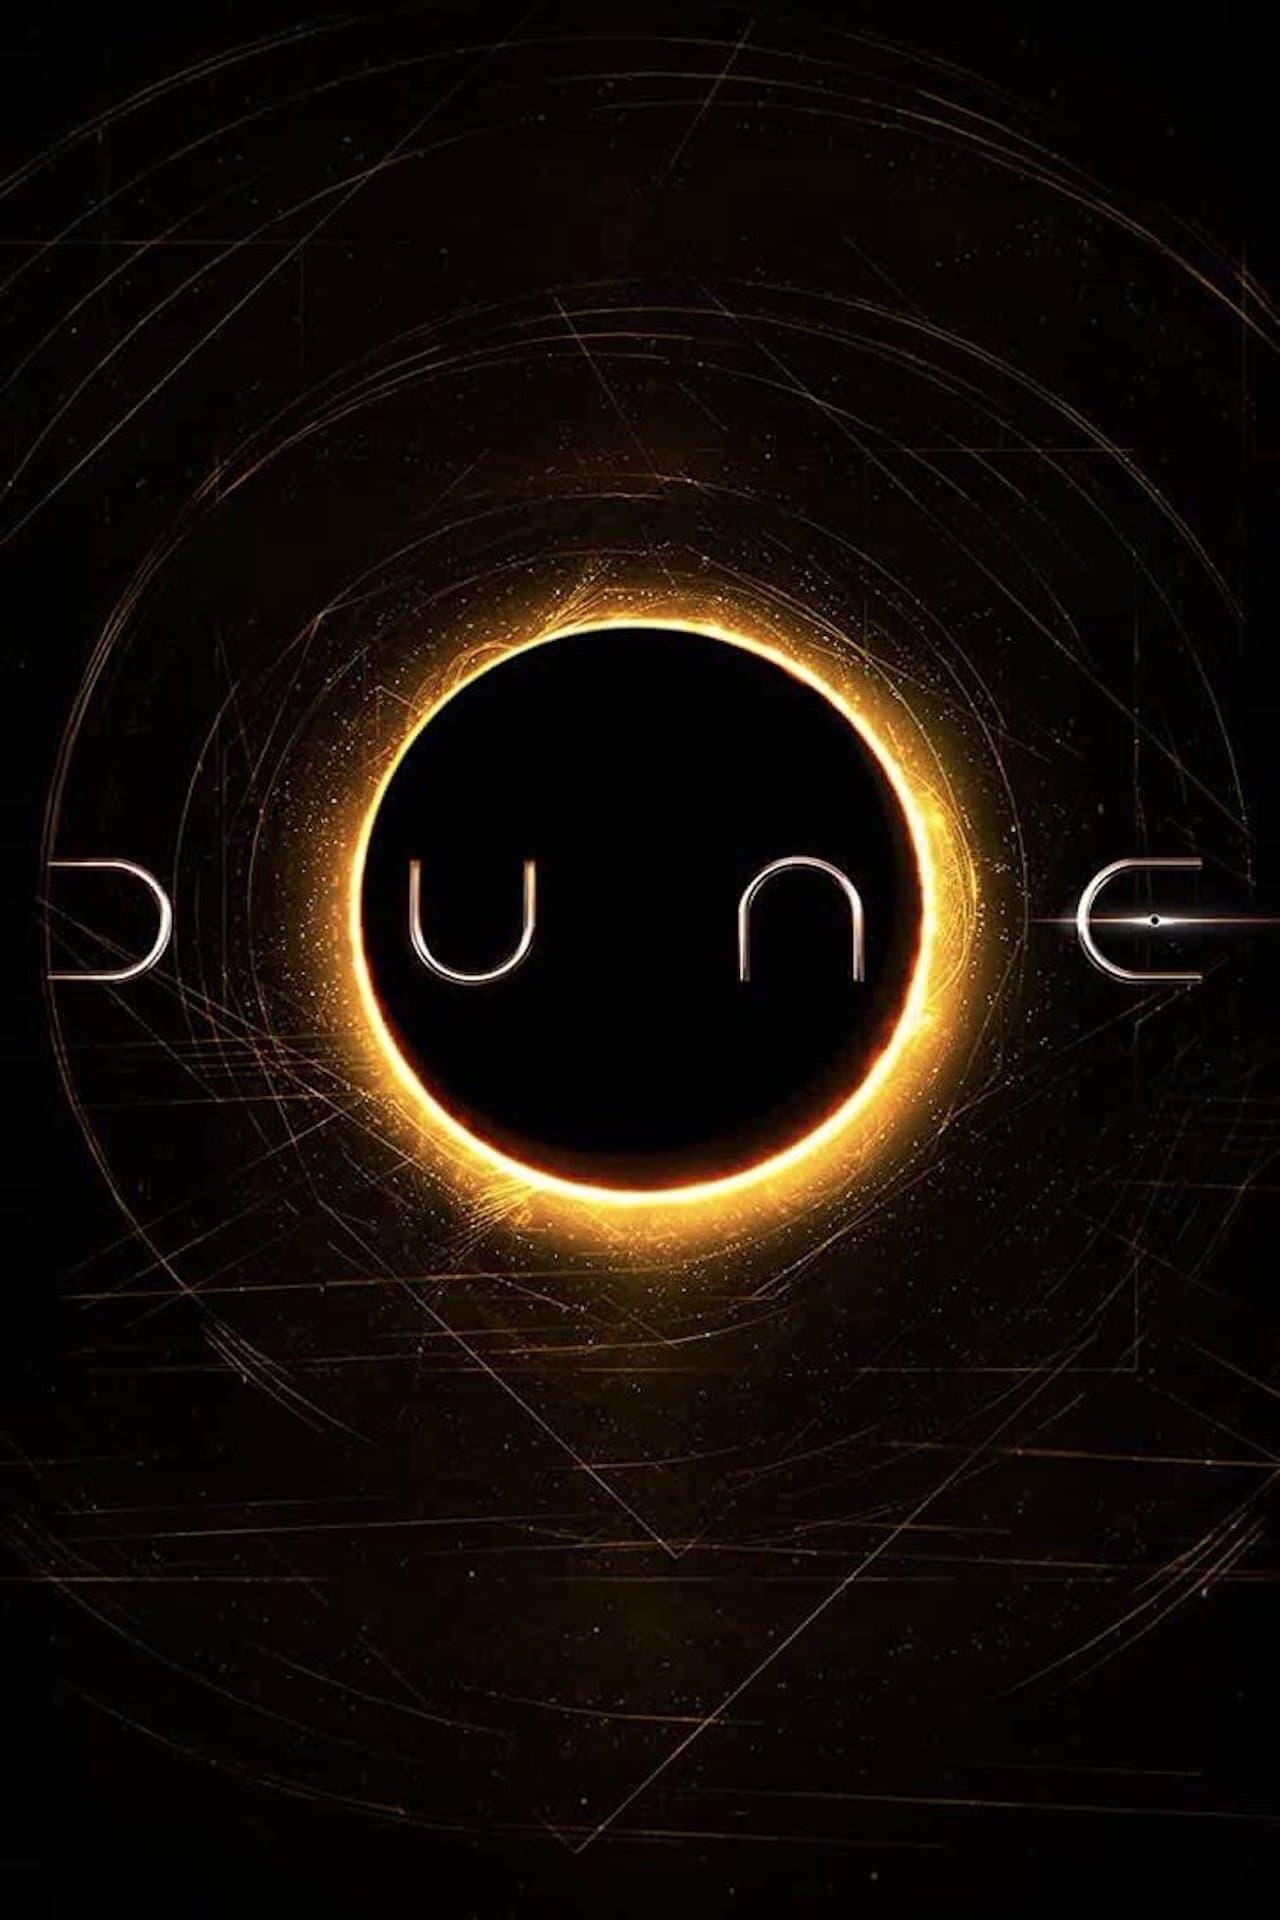 Dune Movie Streaming Online